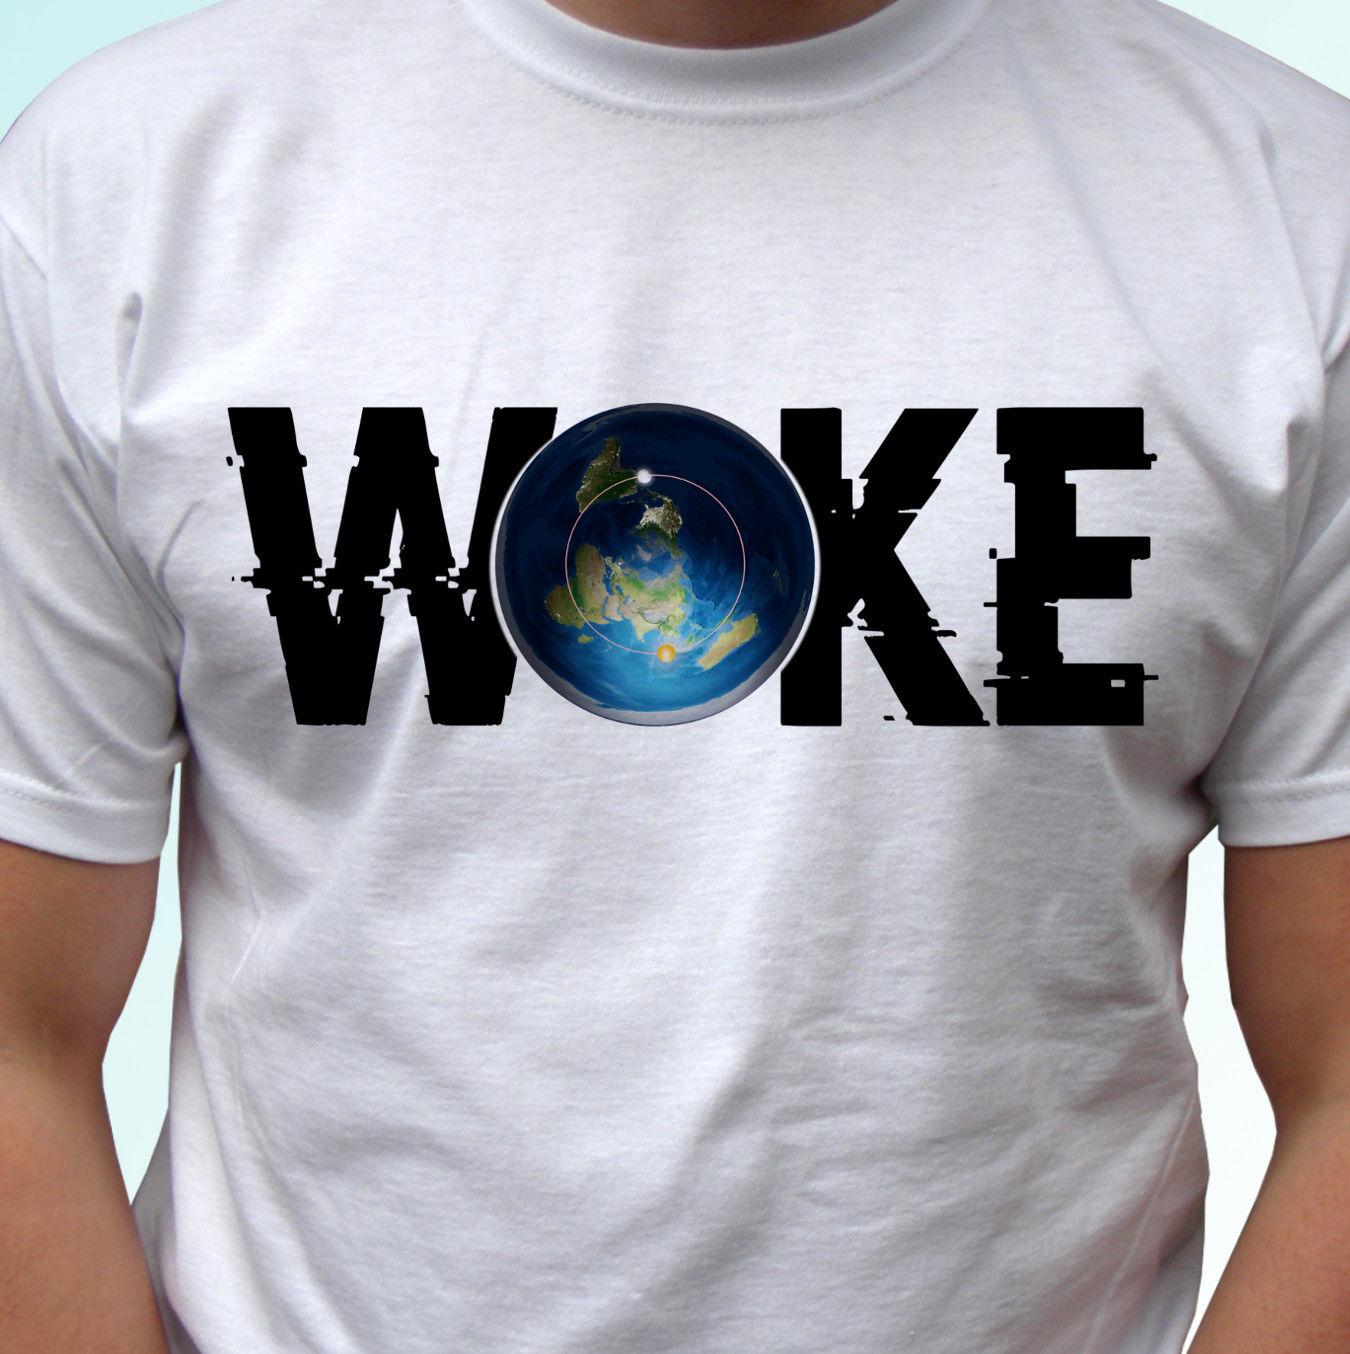 90915ab5 WOKE Flat Earth t shirt quote top tee design mens womens kids sizes ...